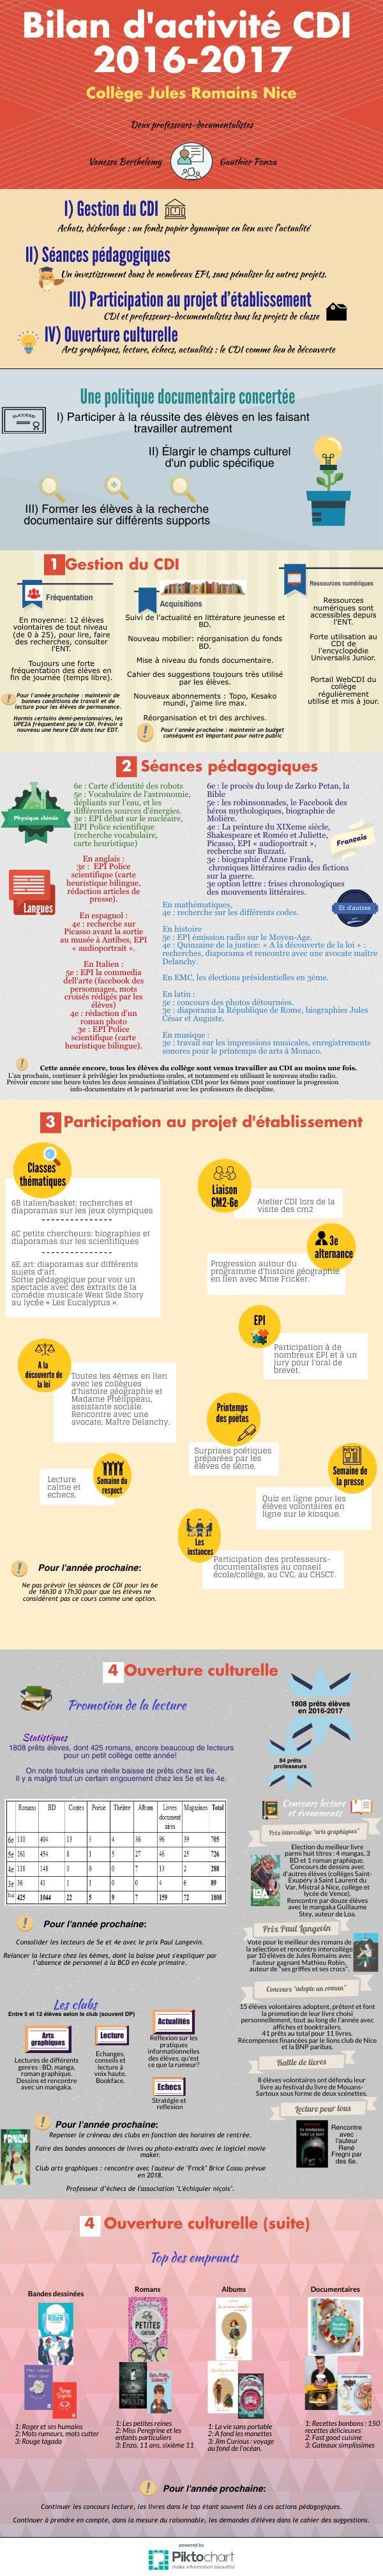 Bilan CDI Jules Romains 2016-2017 | Piktochart Infographic Editor